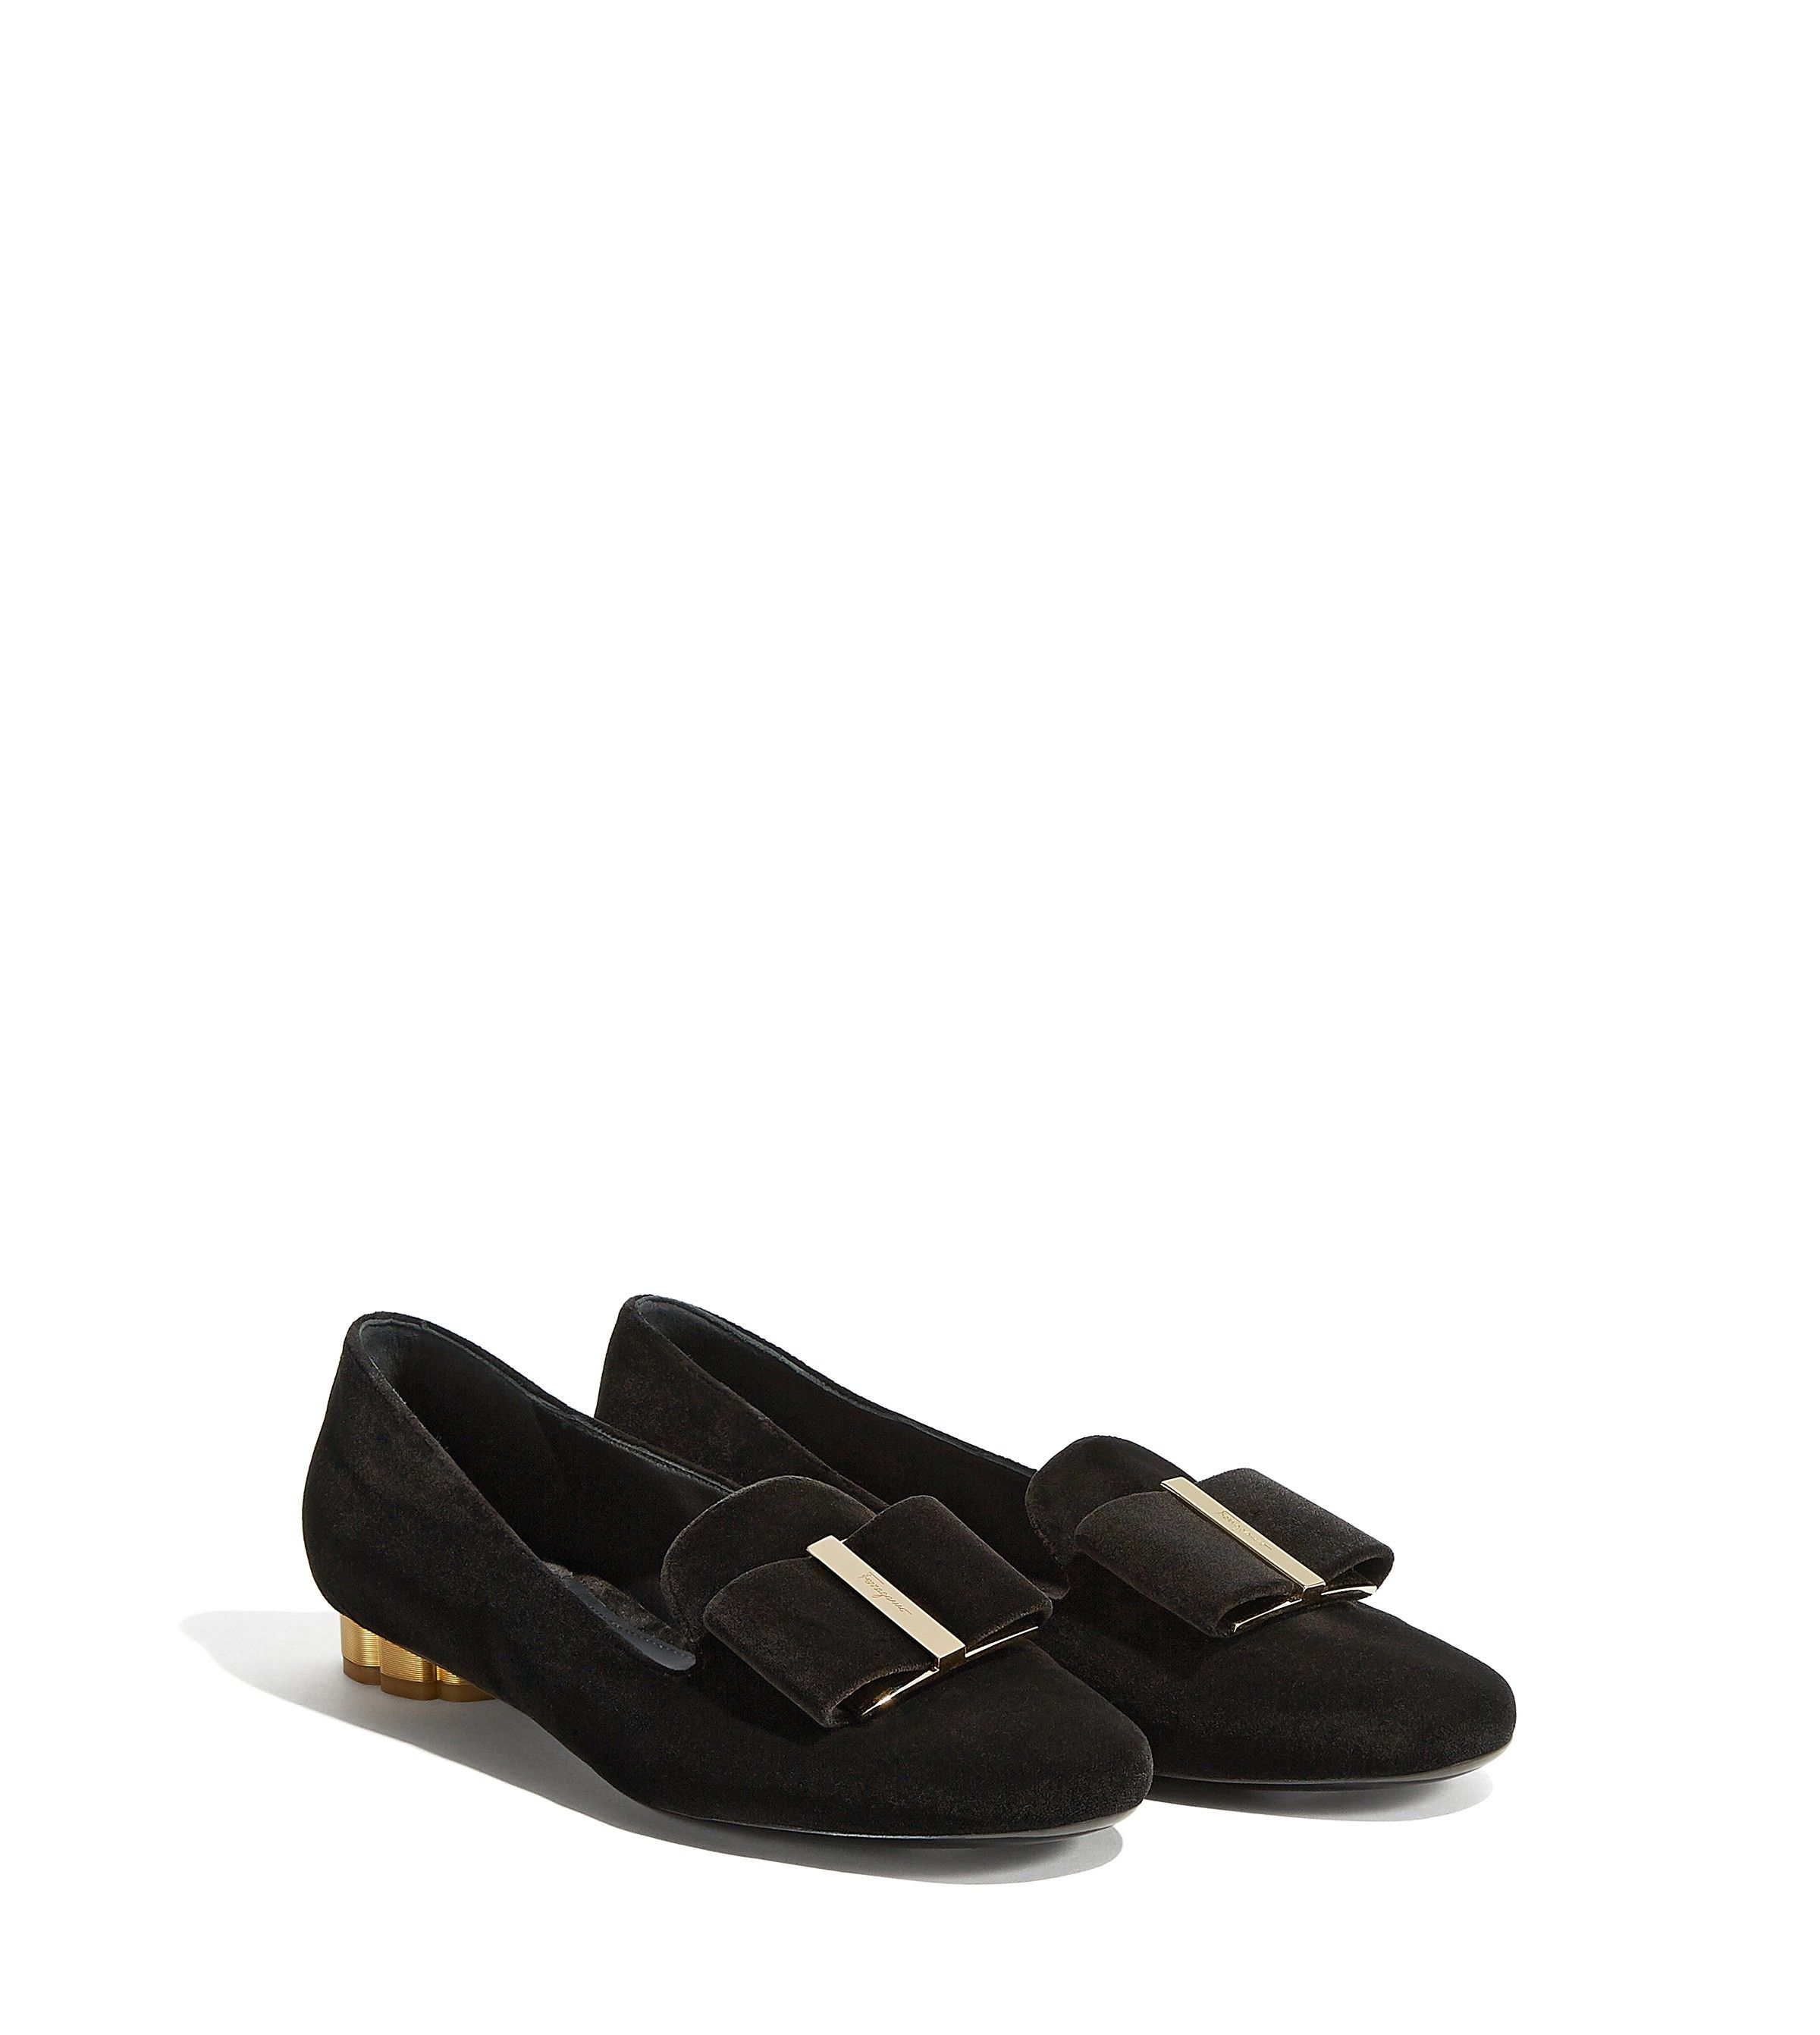 Salvatore Ferragamo Women's Sarno Flower Heel Smoking Loafer 4xQJjS